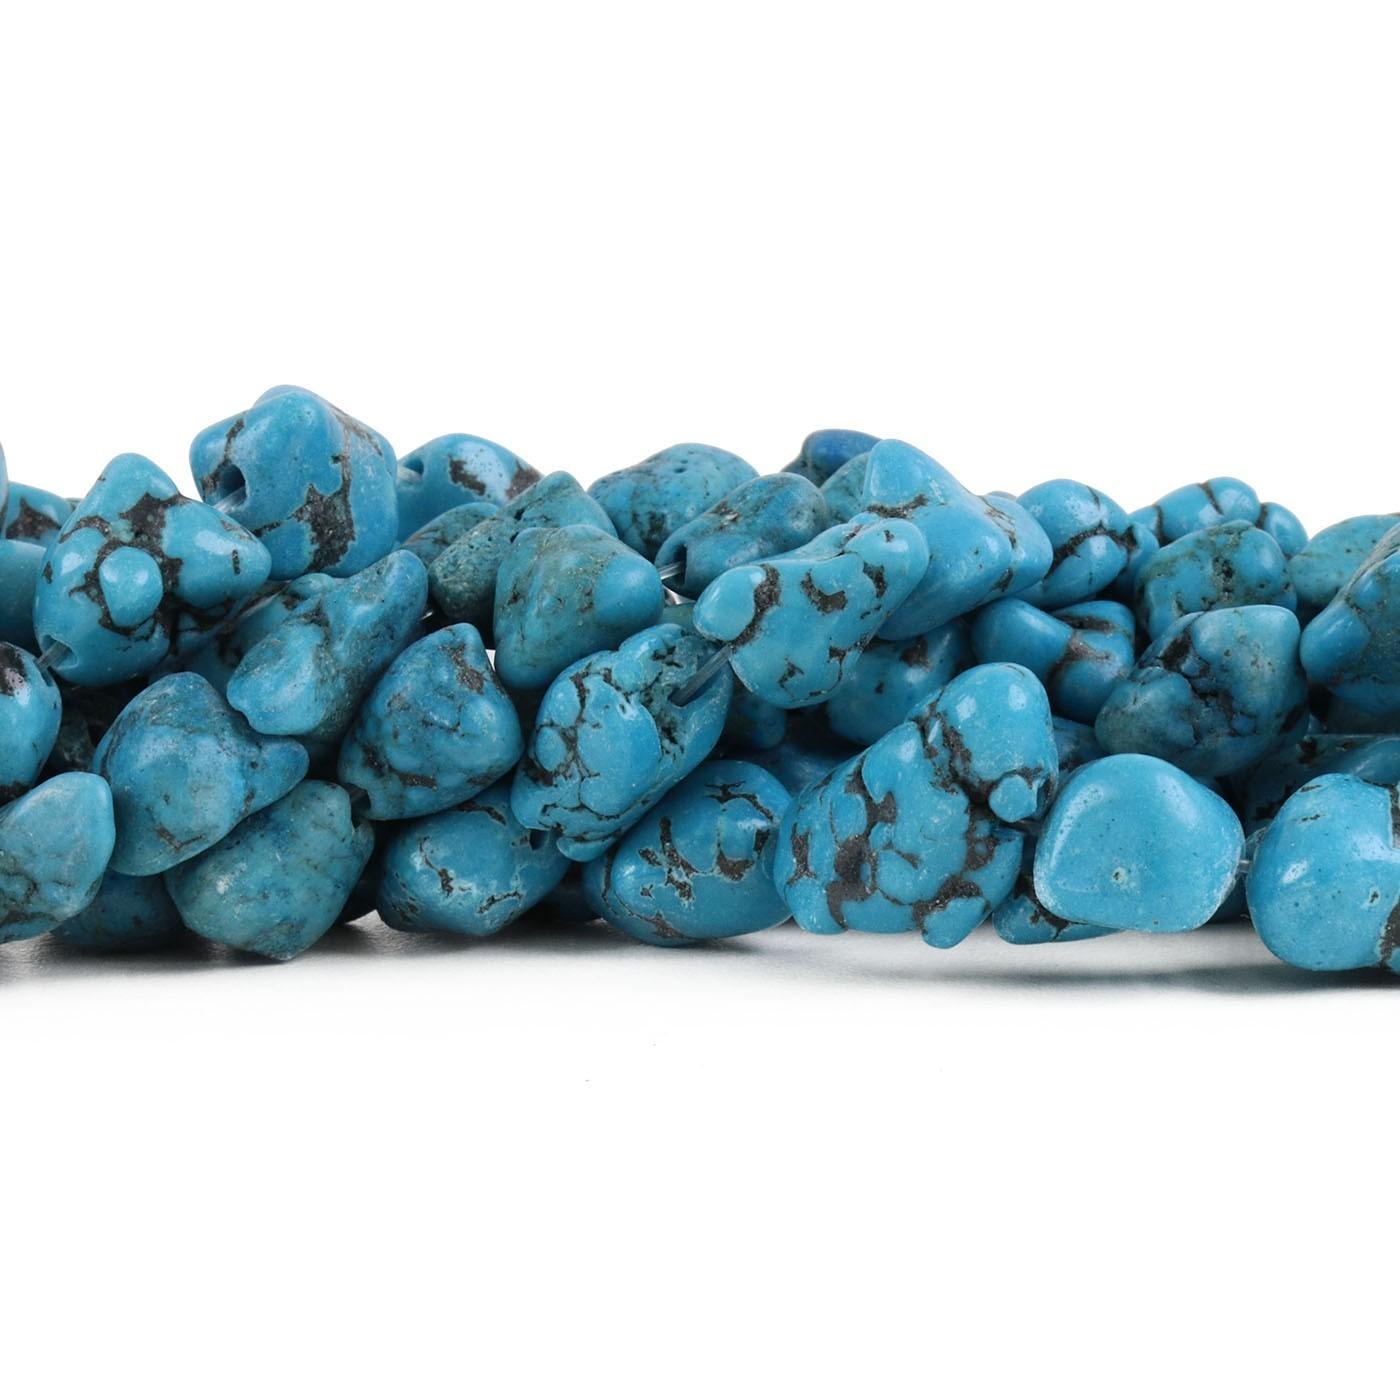 Fio de Turquesa Cérebro Azul Rolada - RO048  - ArtStones